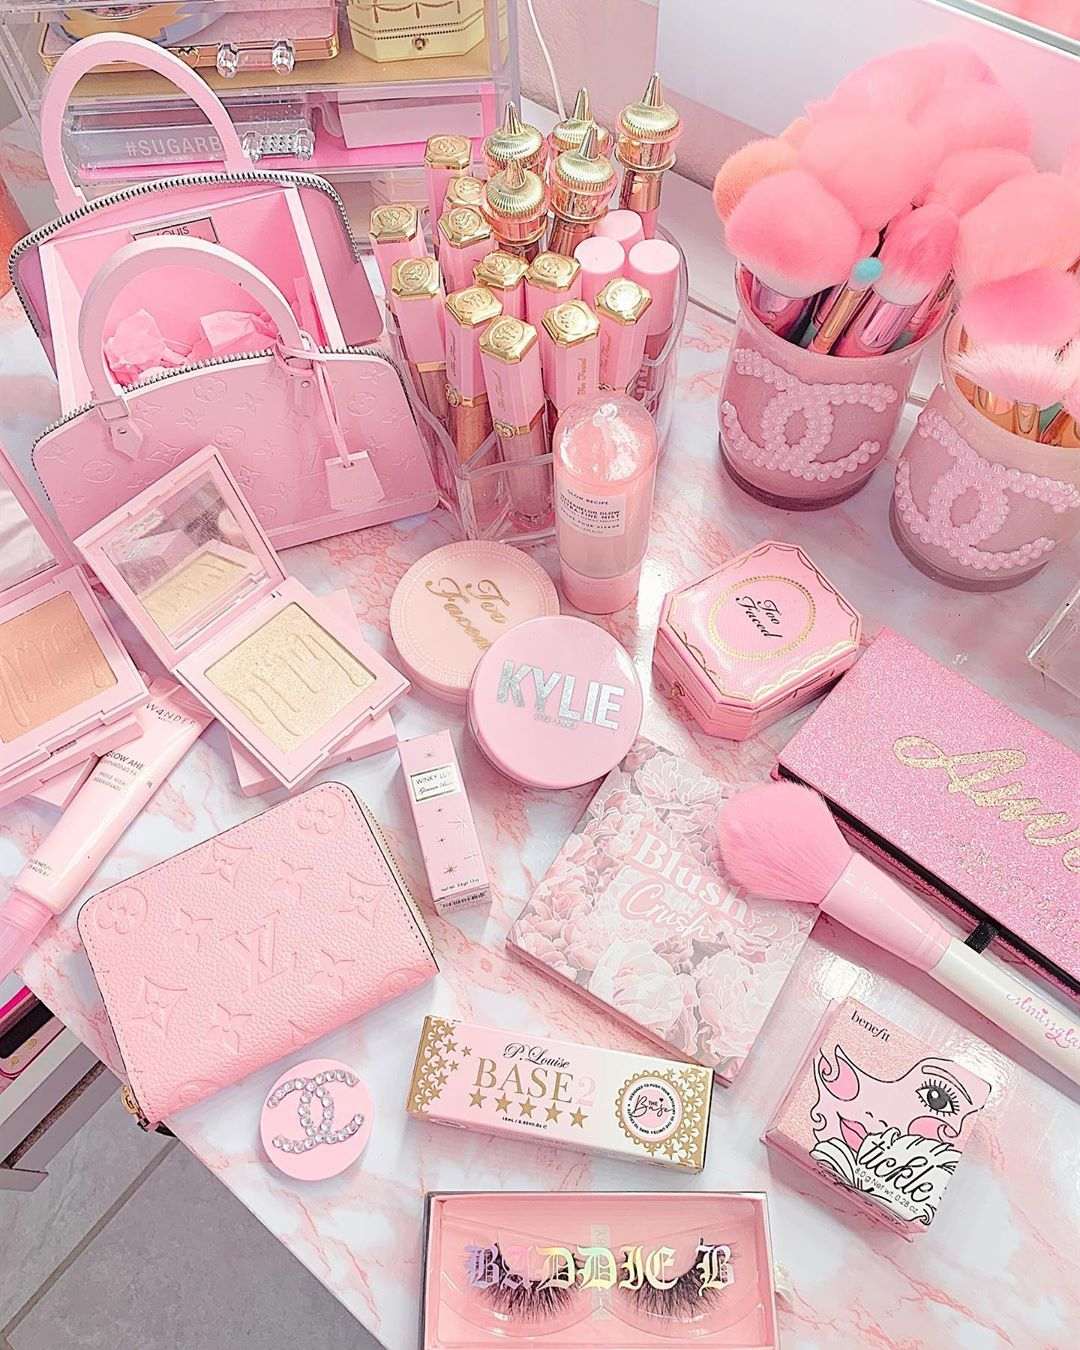 Brushes N Lash In 2020 Baby Pink Aesthetic Pink Girly Things Pastel Pink Aesthetic